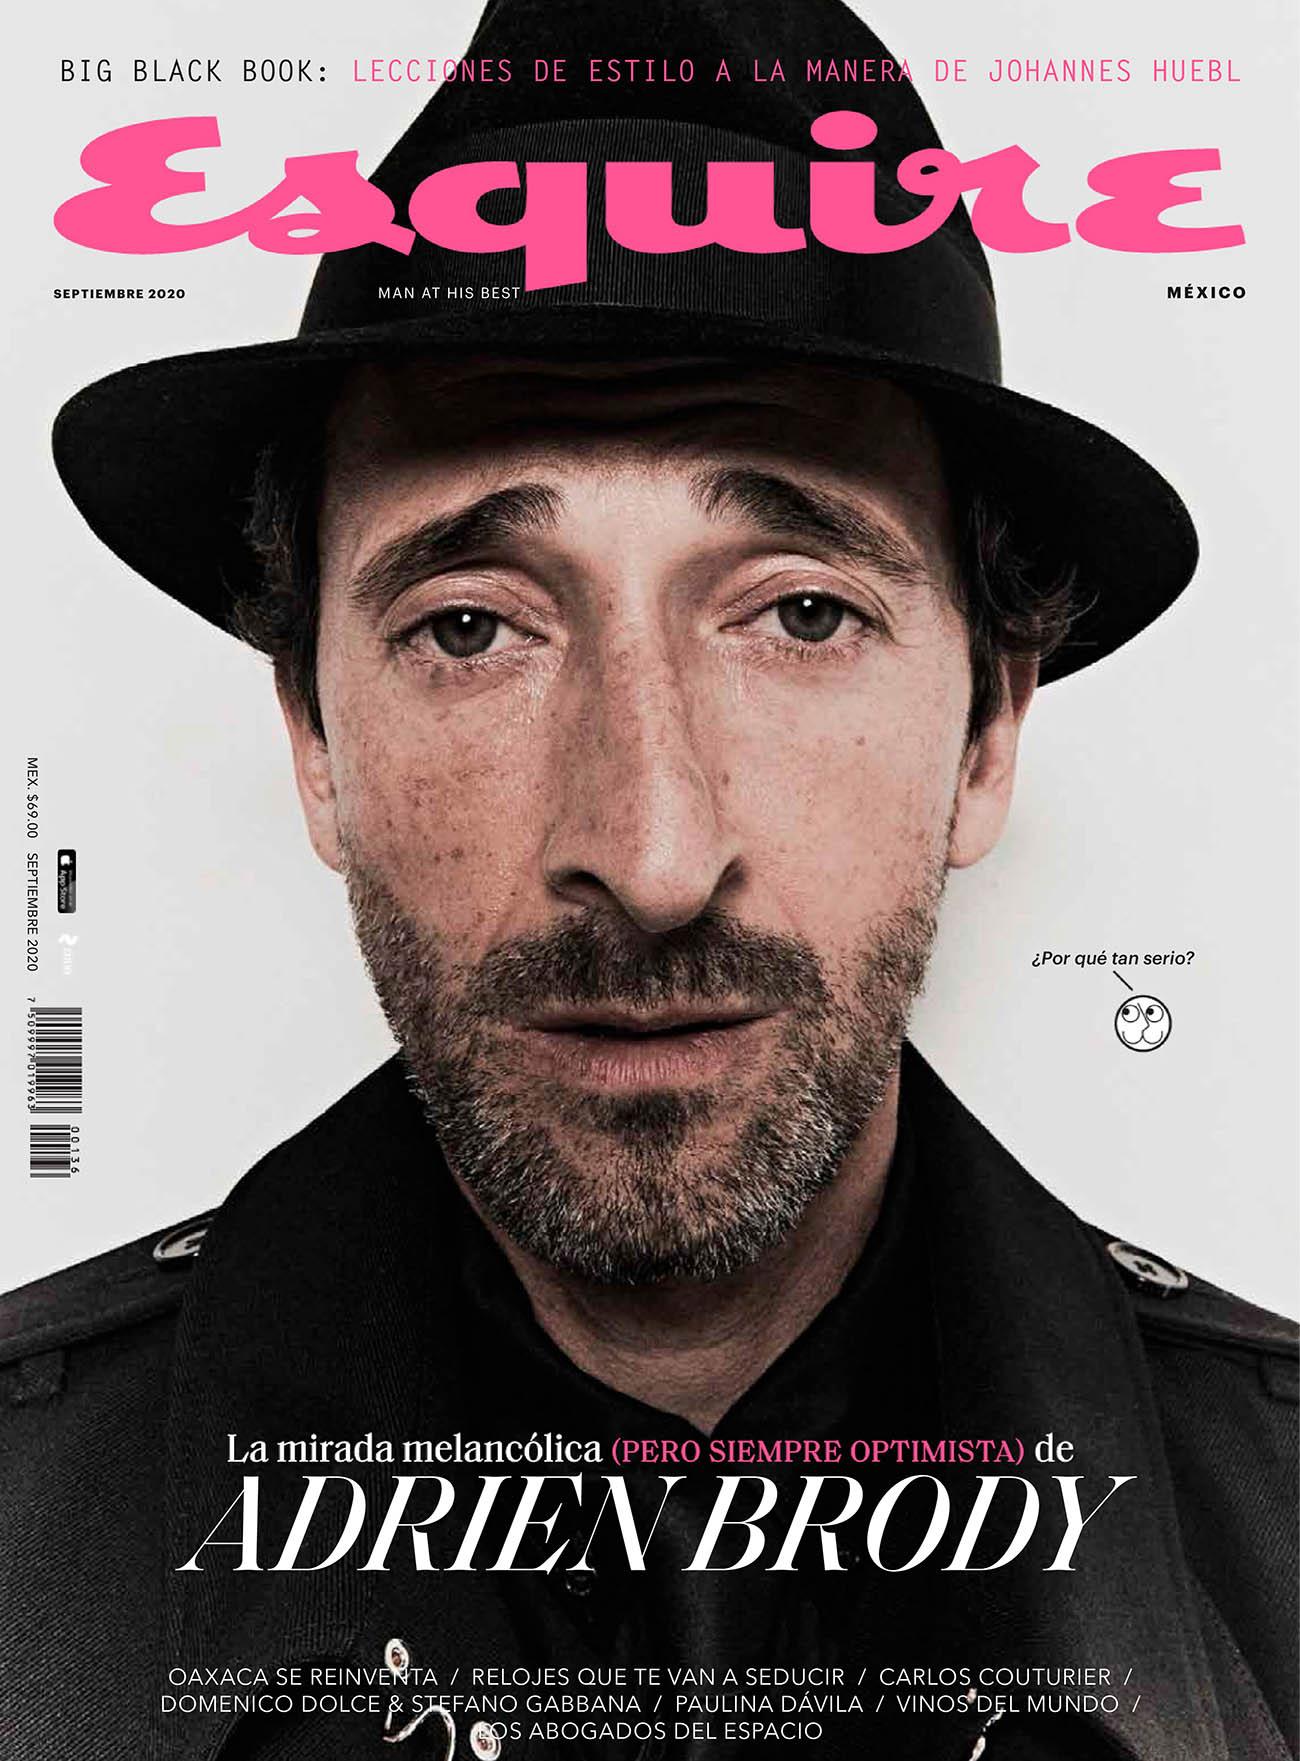 Adrien Brody covers Esquire Mexico September 2020 by Cesar Balcazar